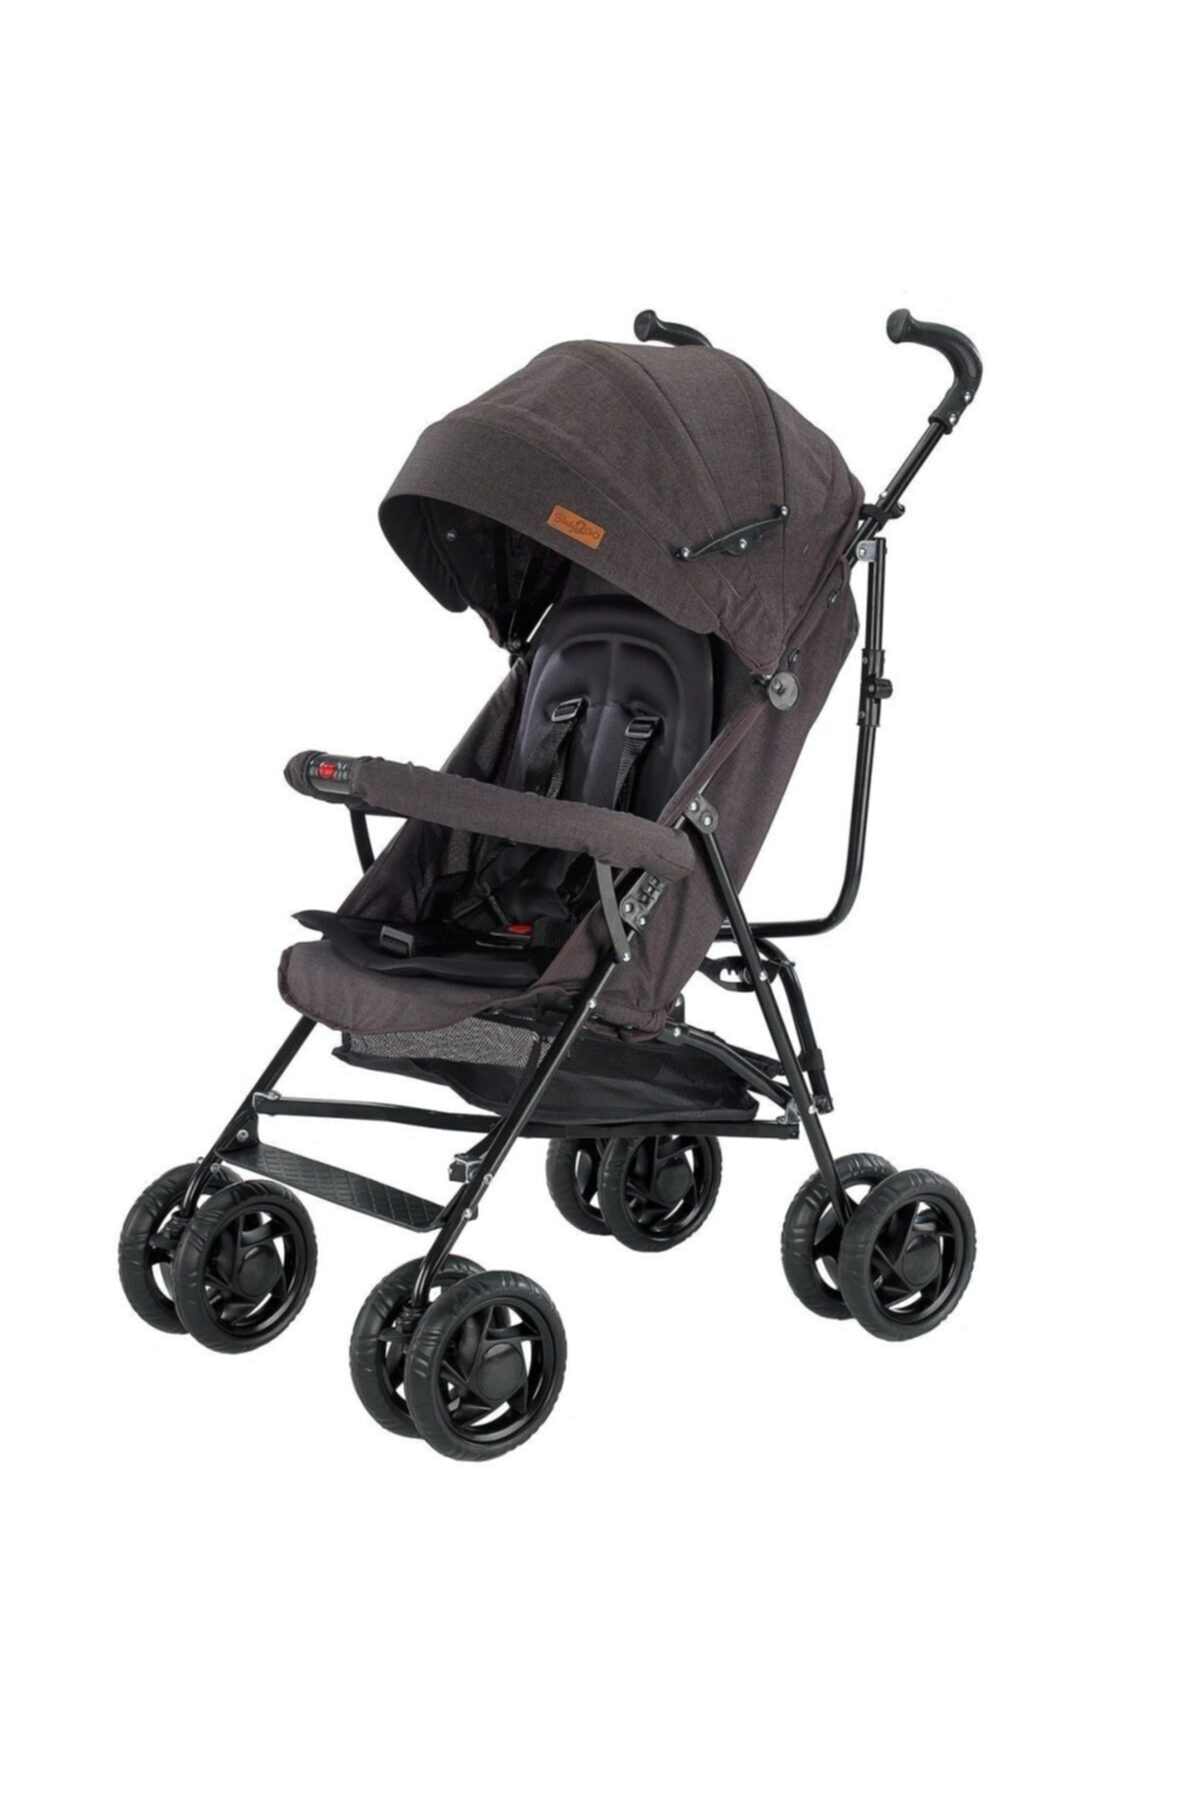 Luxury multifunctional baby stroller newborn foldable stroller baby carriage enlarge